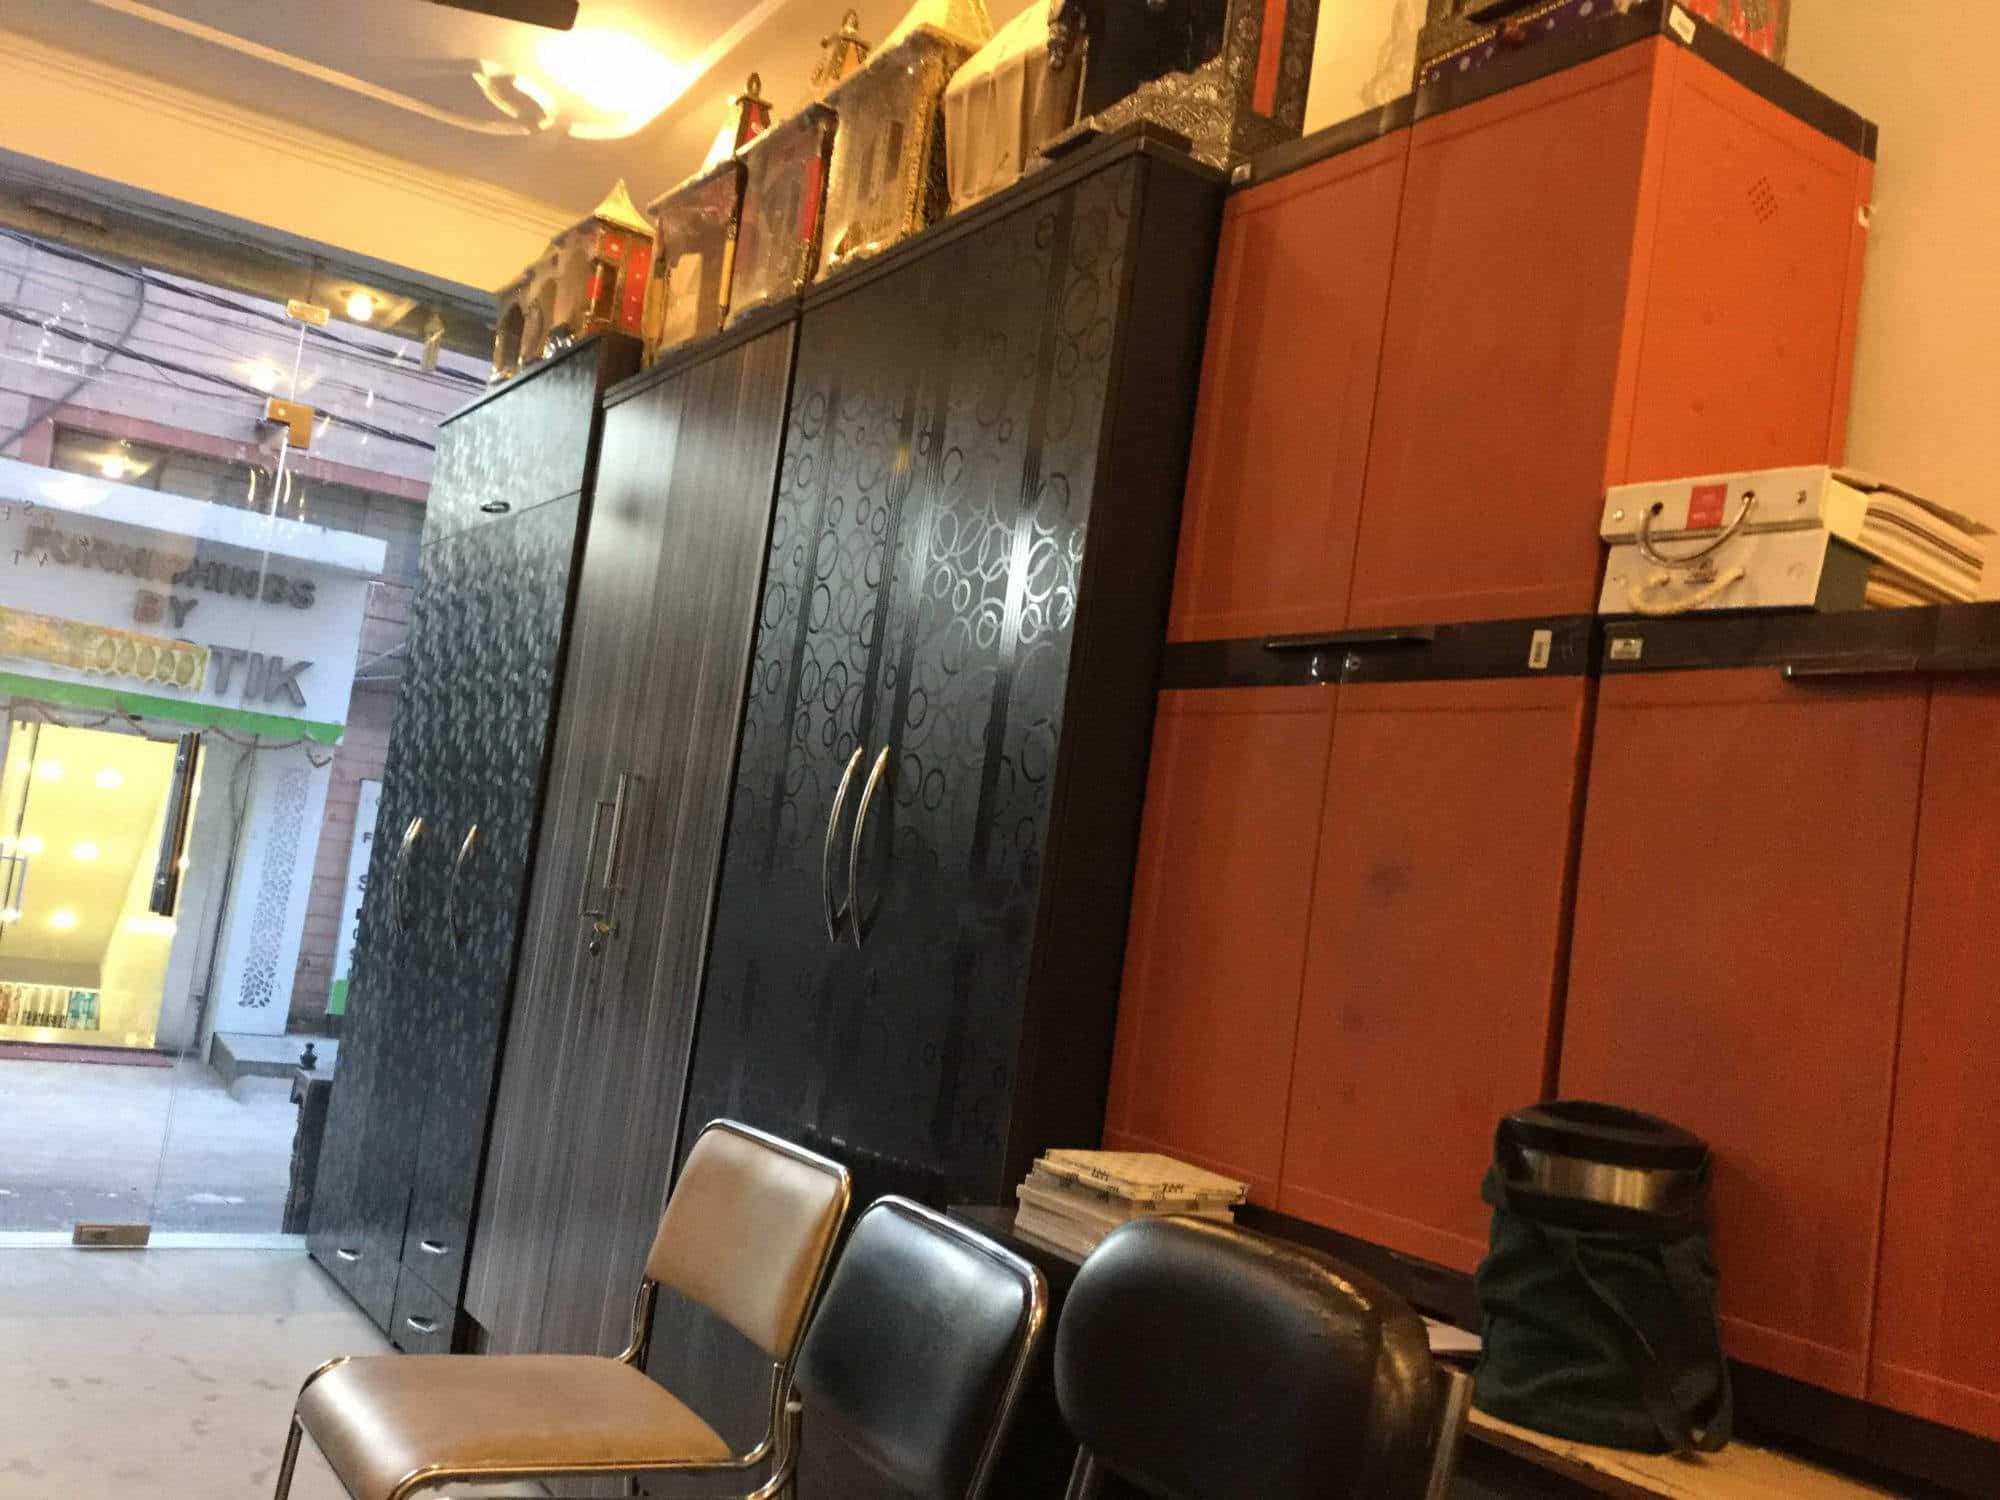 Gsf Montage Furniture, Kirti Nagar   Furniture Dealers In Delhi   Justdial